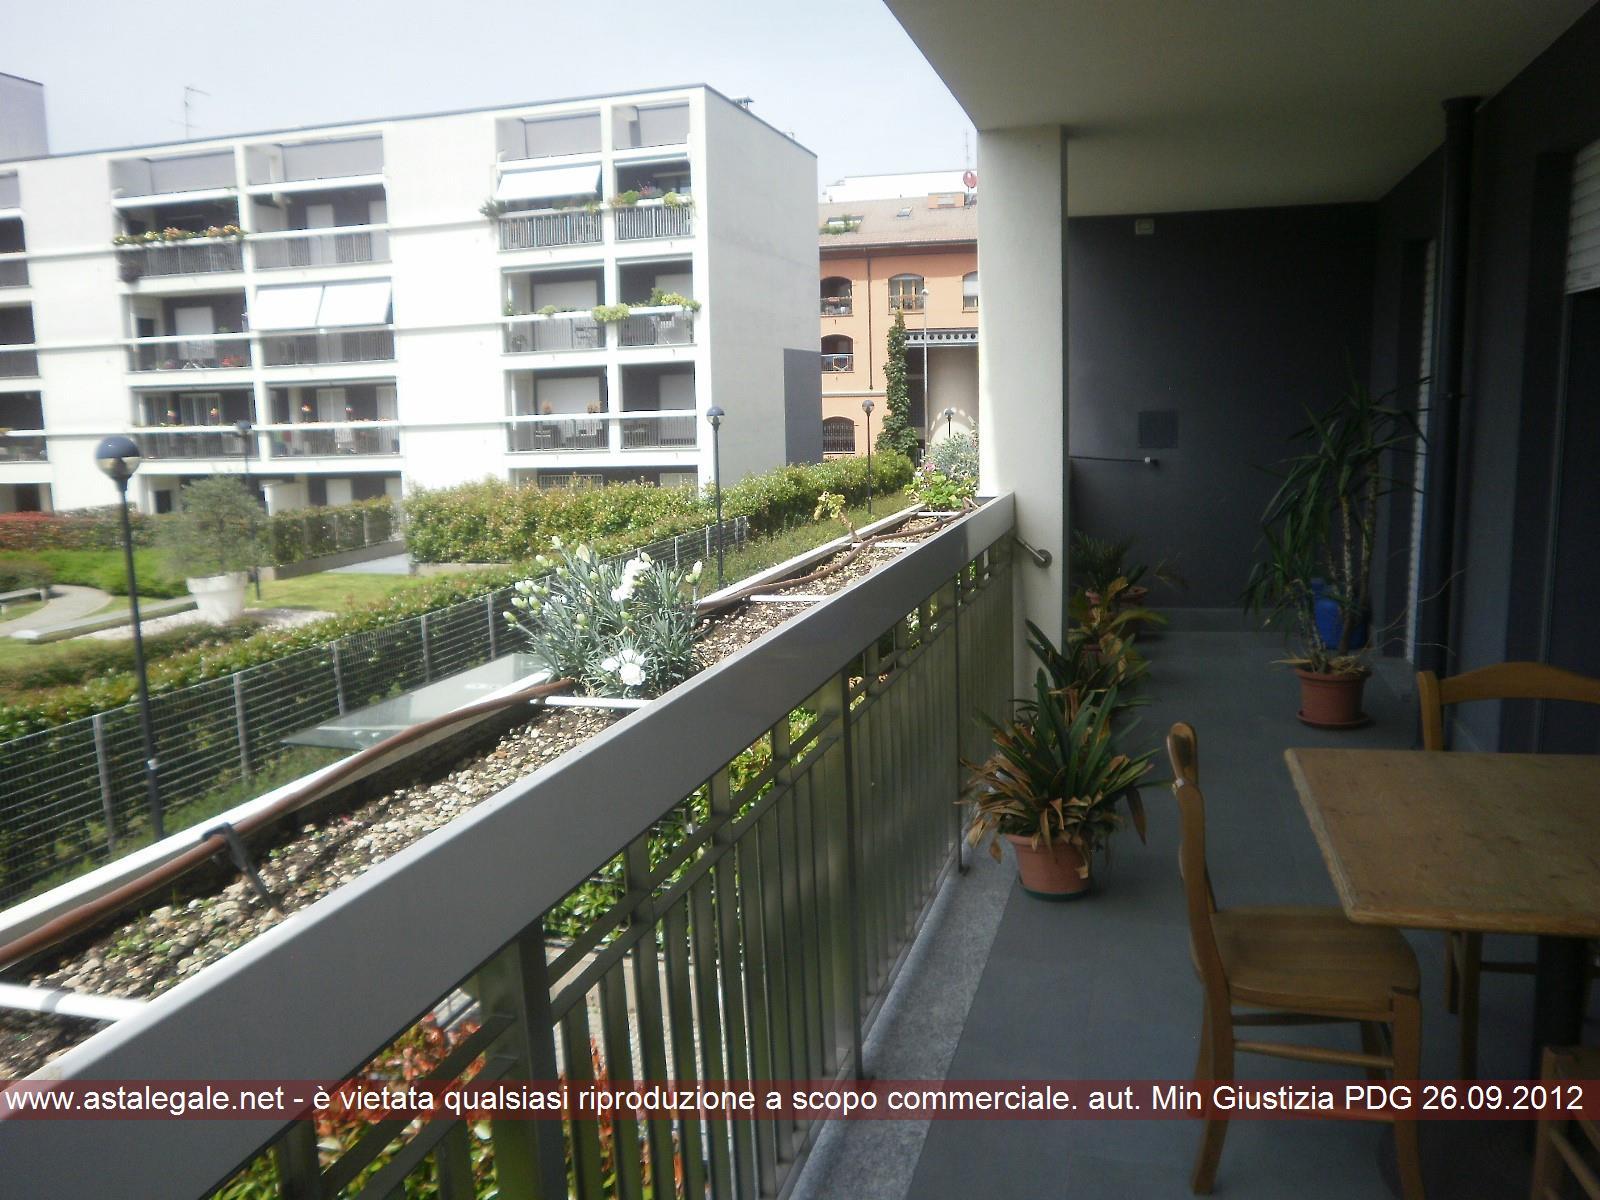 Monza (MB) Via Galileo Ferraris 7/b